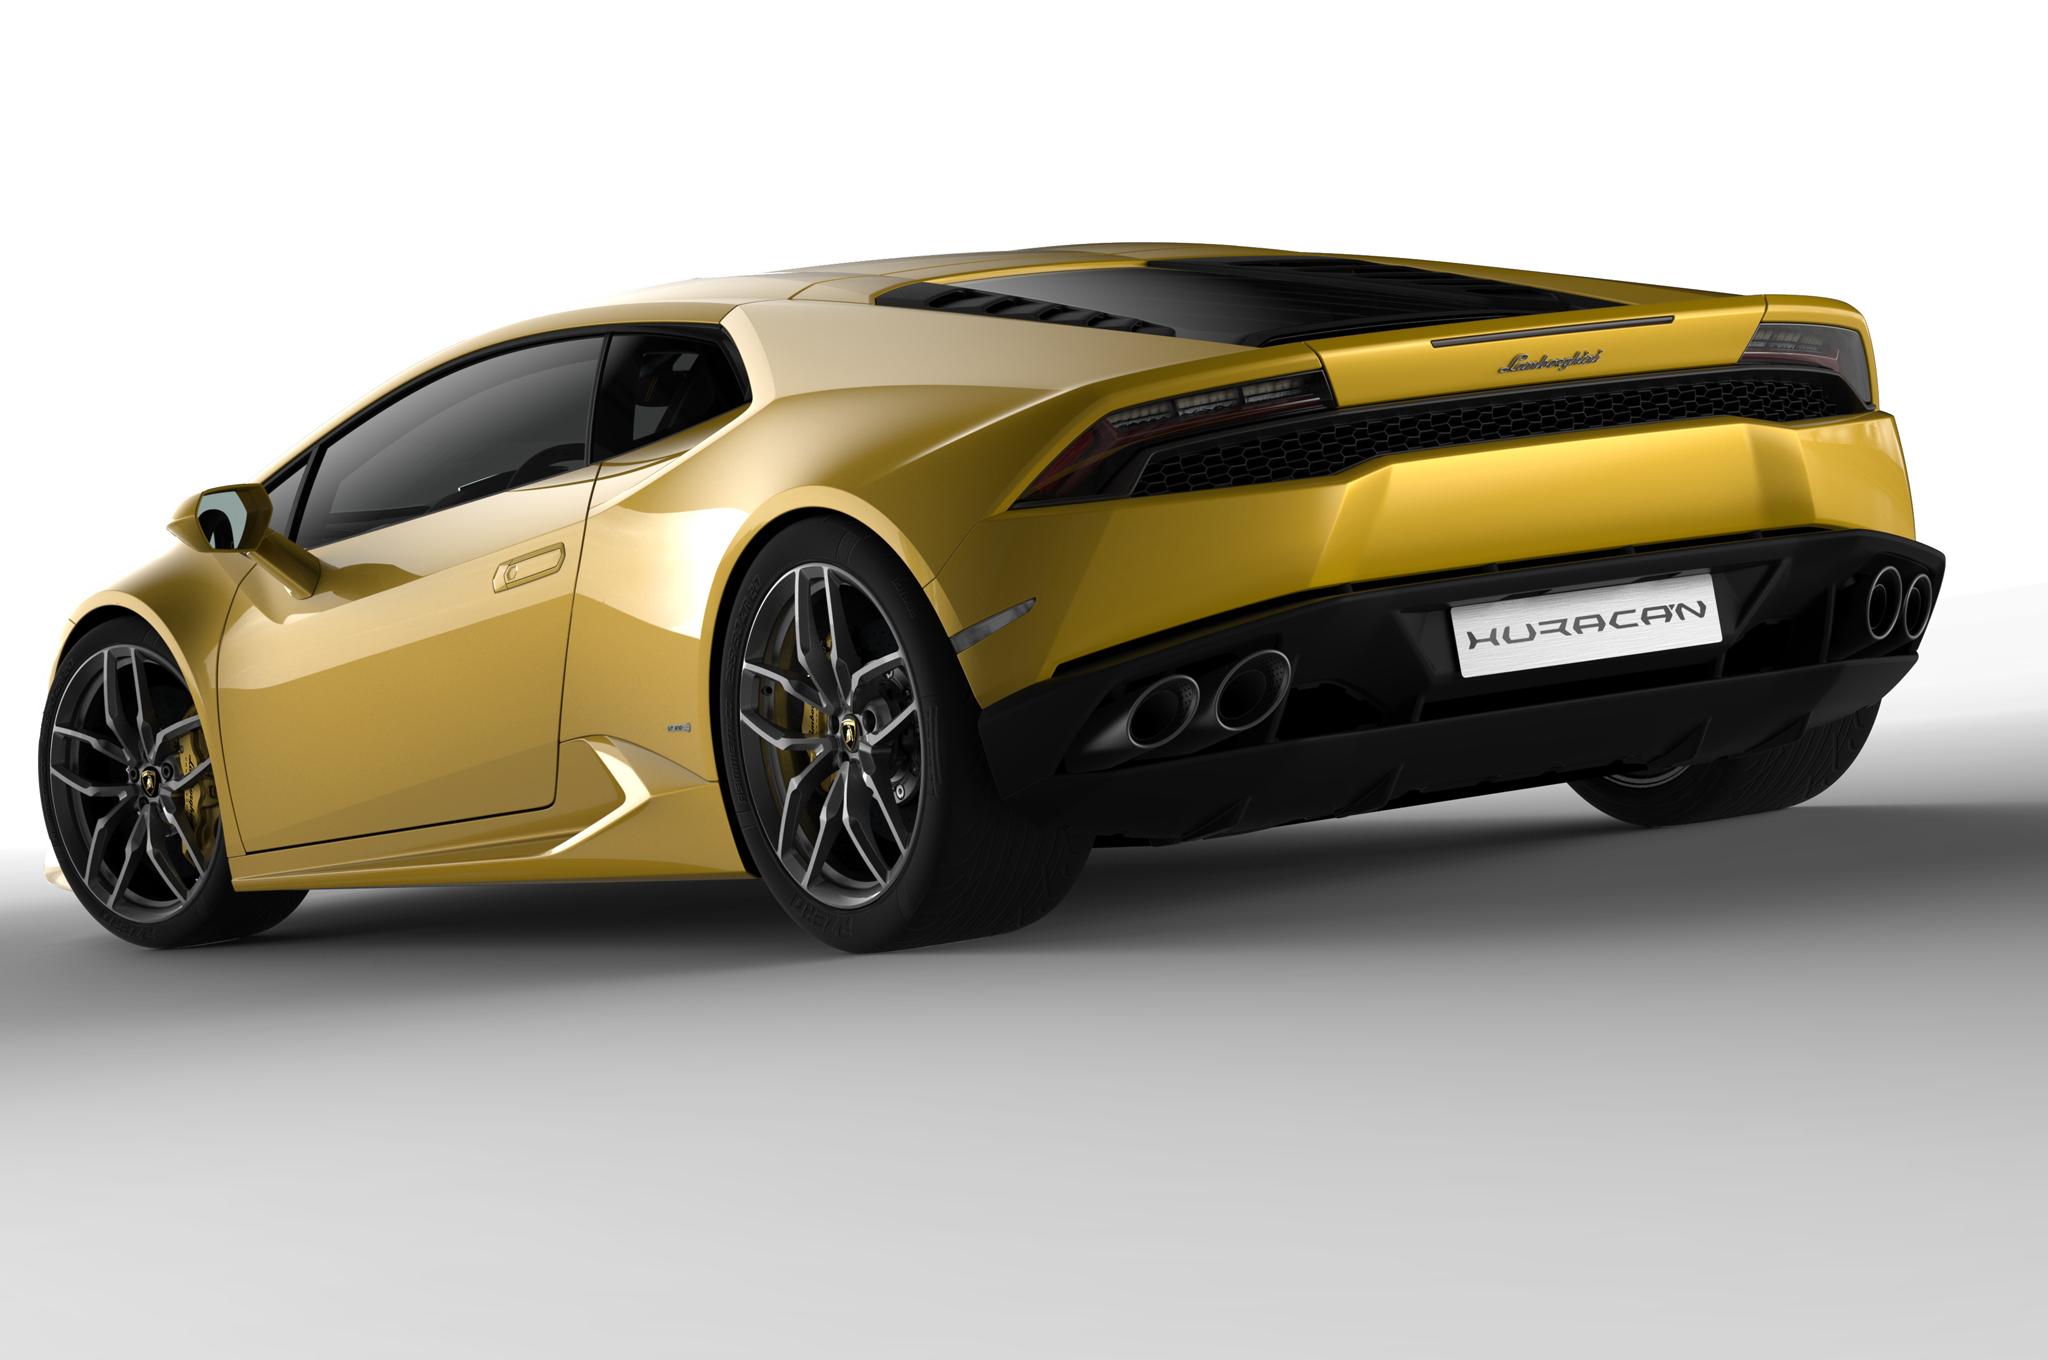 2015 lamborghini huracan 6 2015 lamborghini huracan 6 - Lamborghini 2015